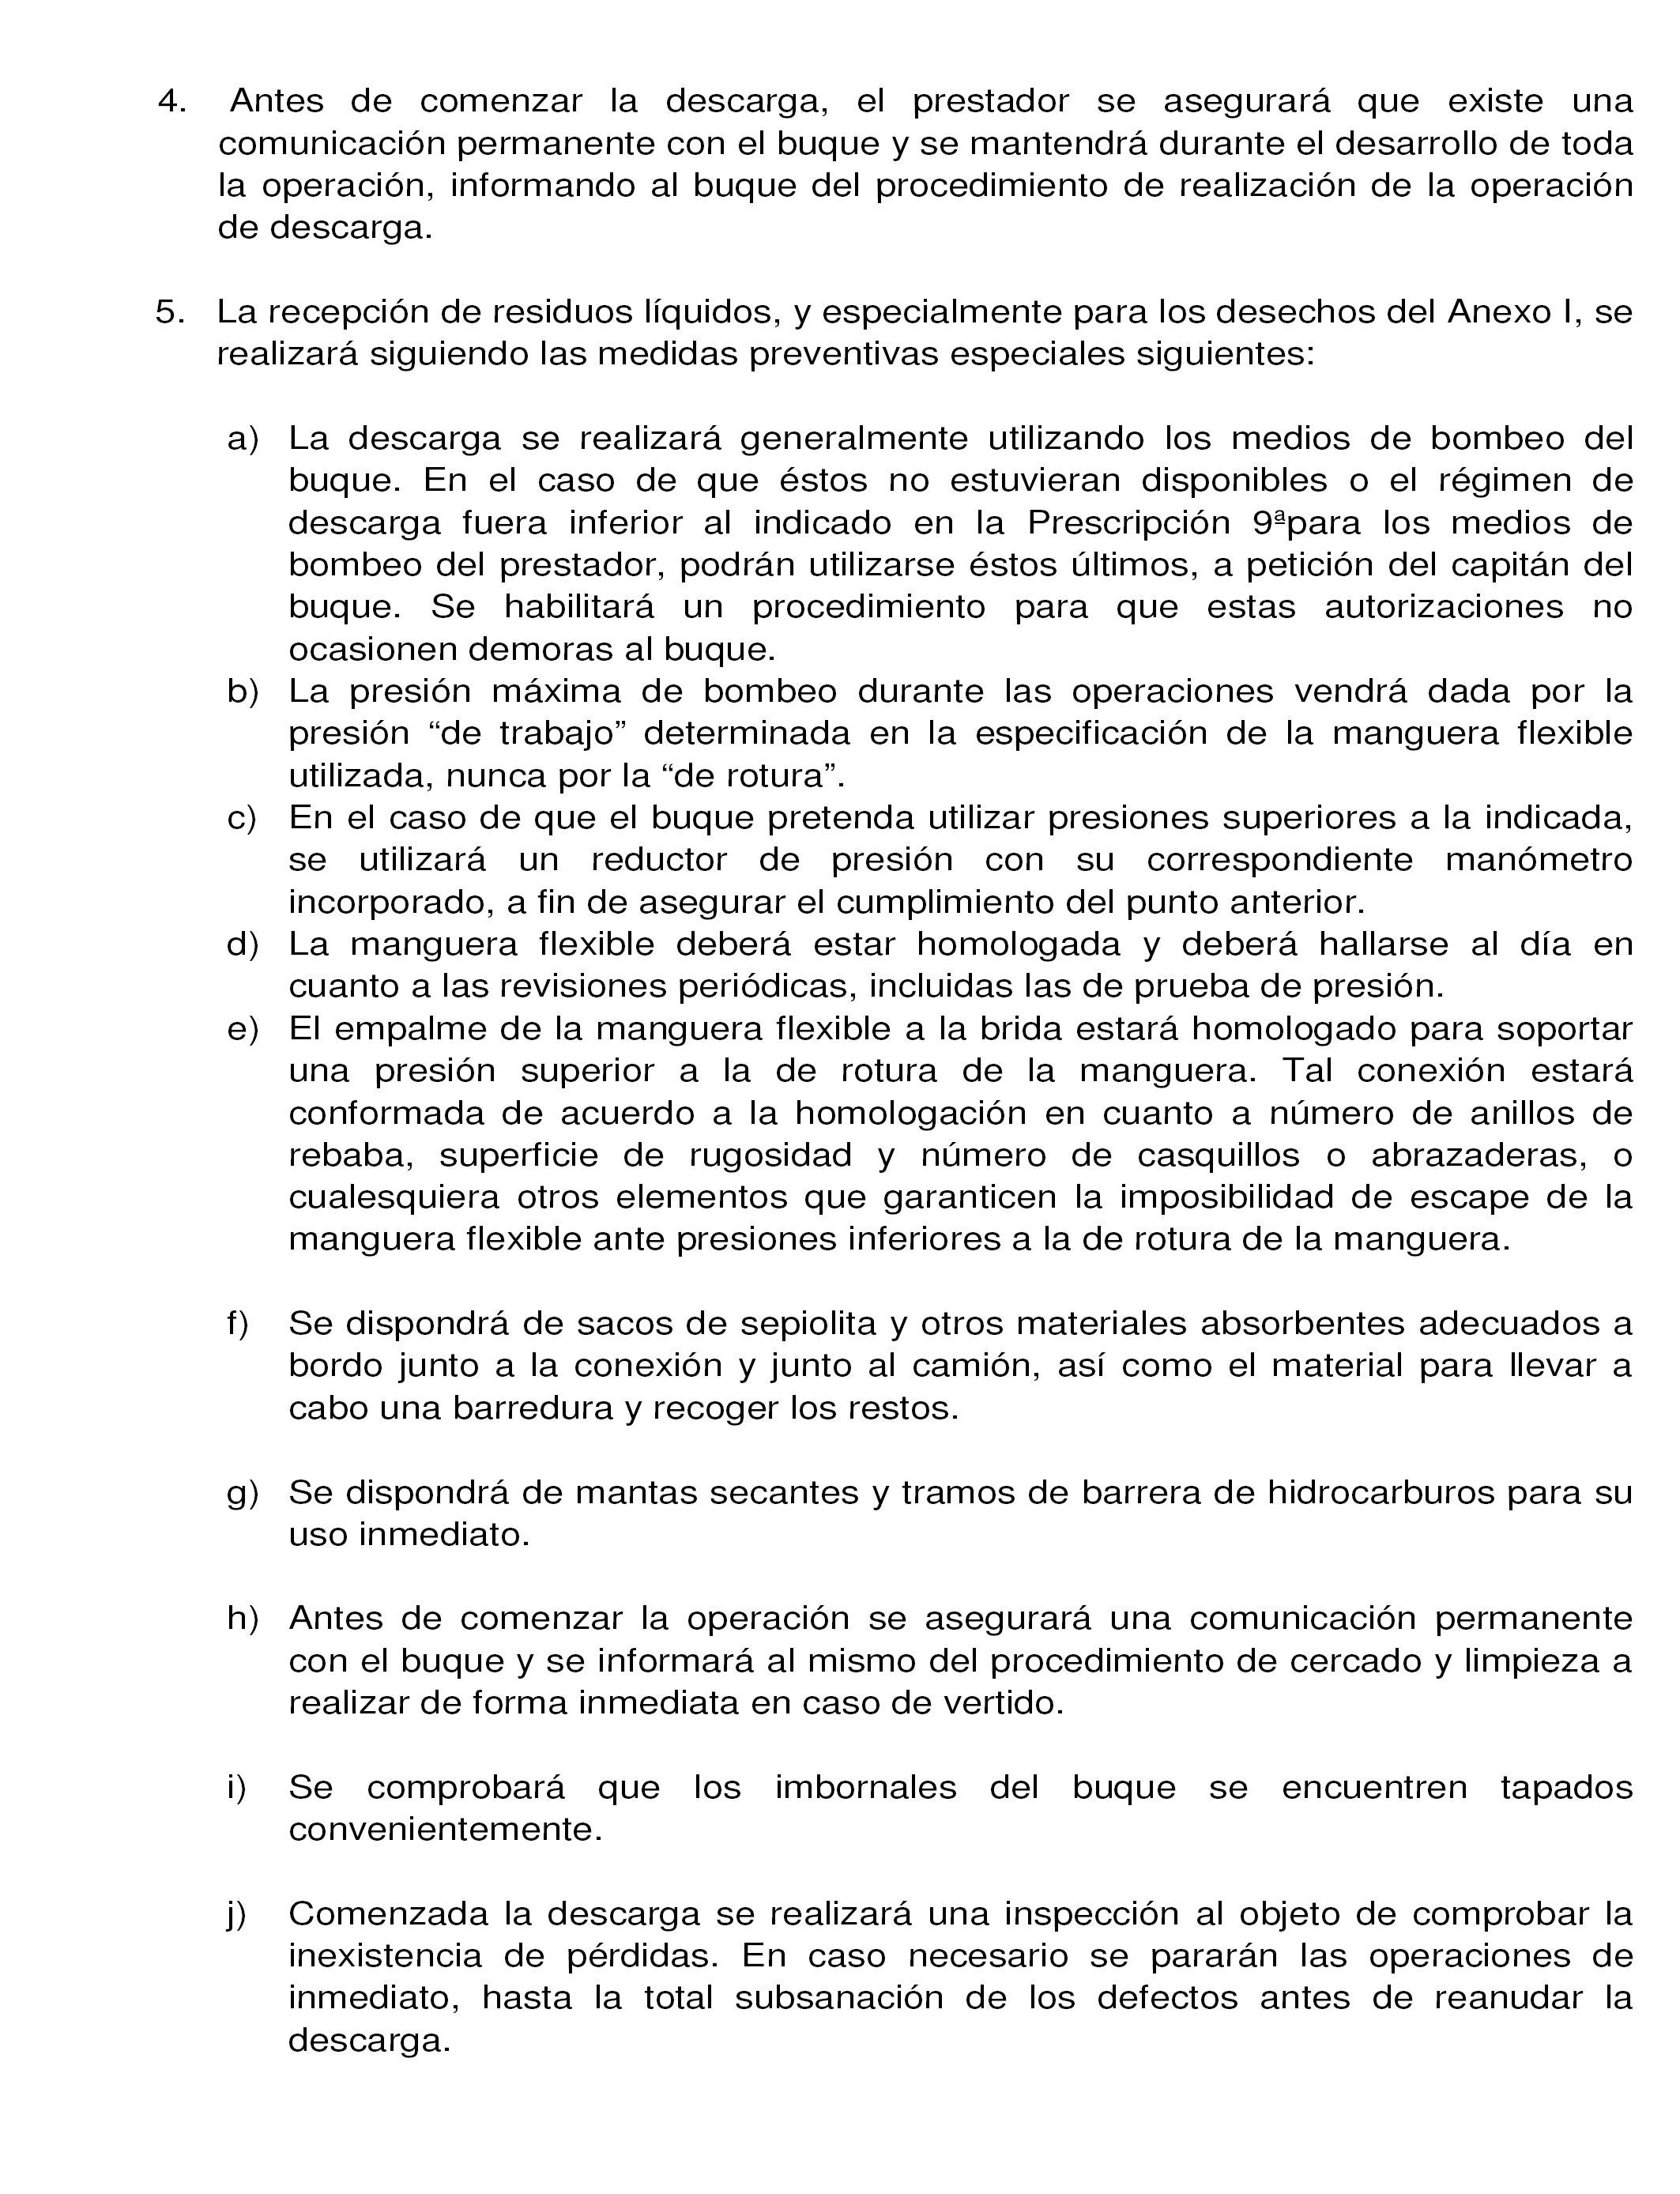 BOE.es - Documento BOE-A-2016-8668